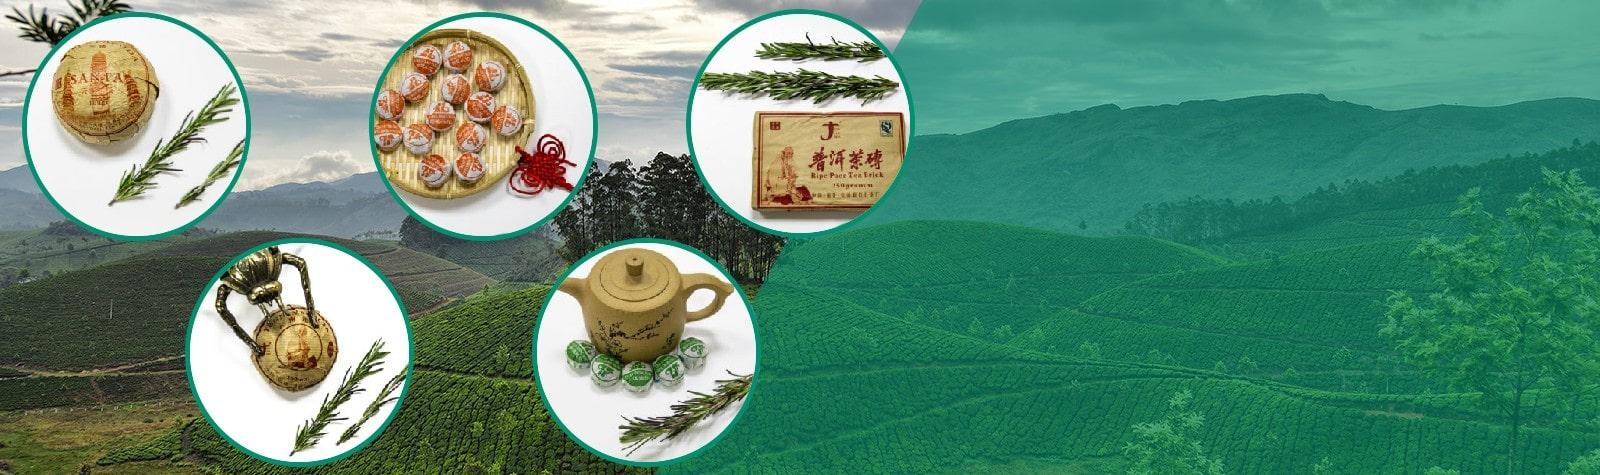 Чайная плантация зеленого чая, улун